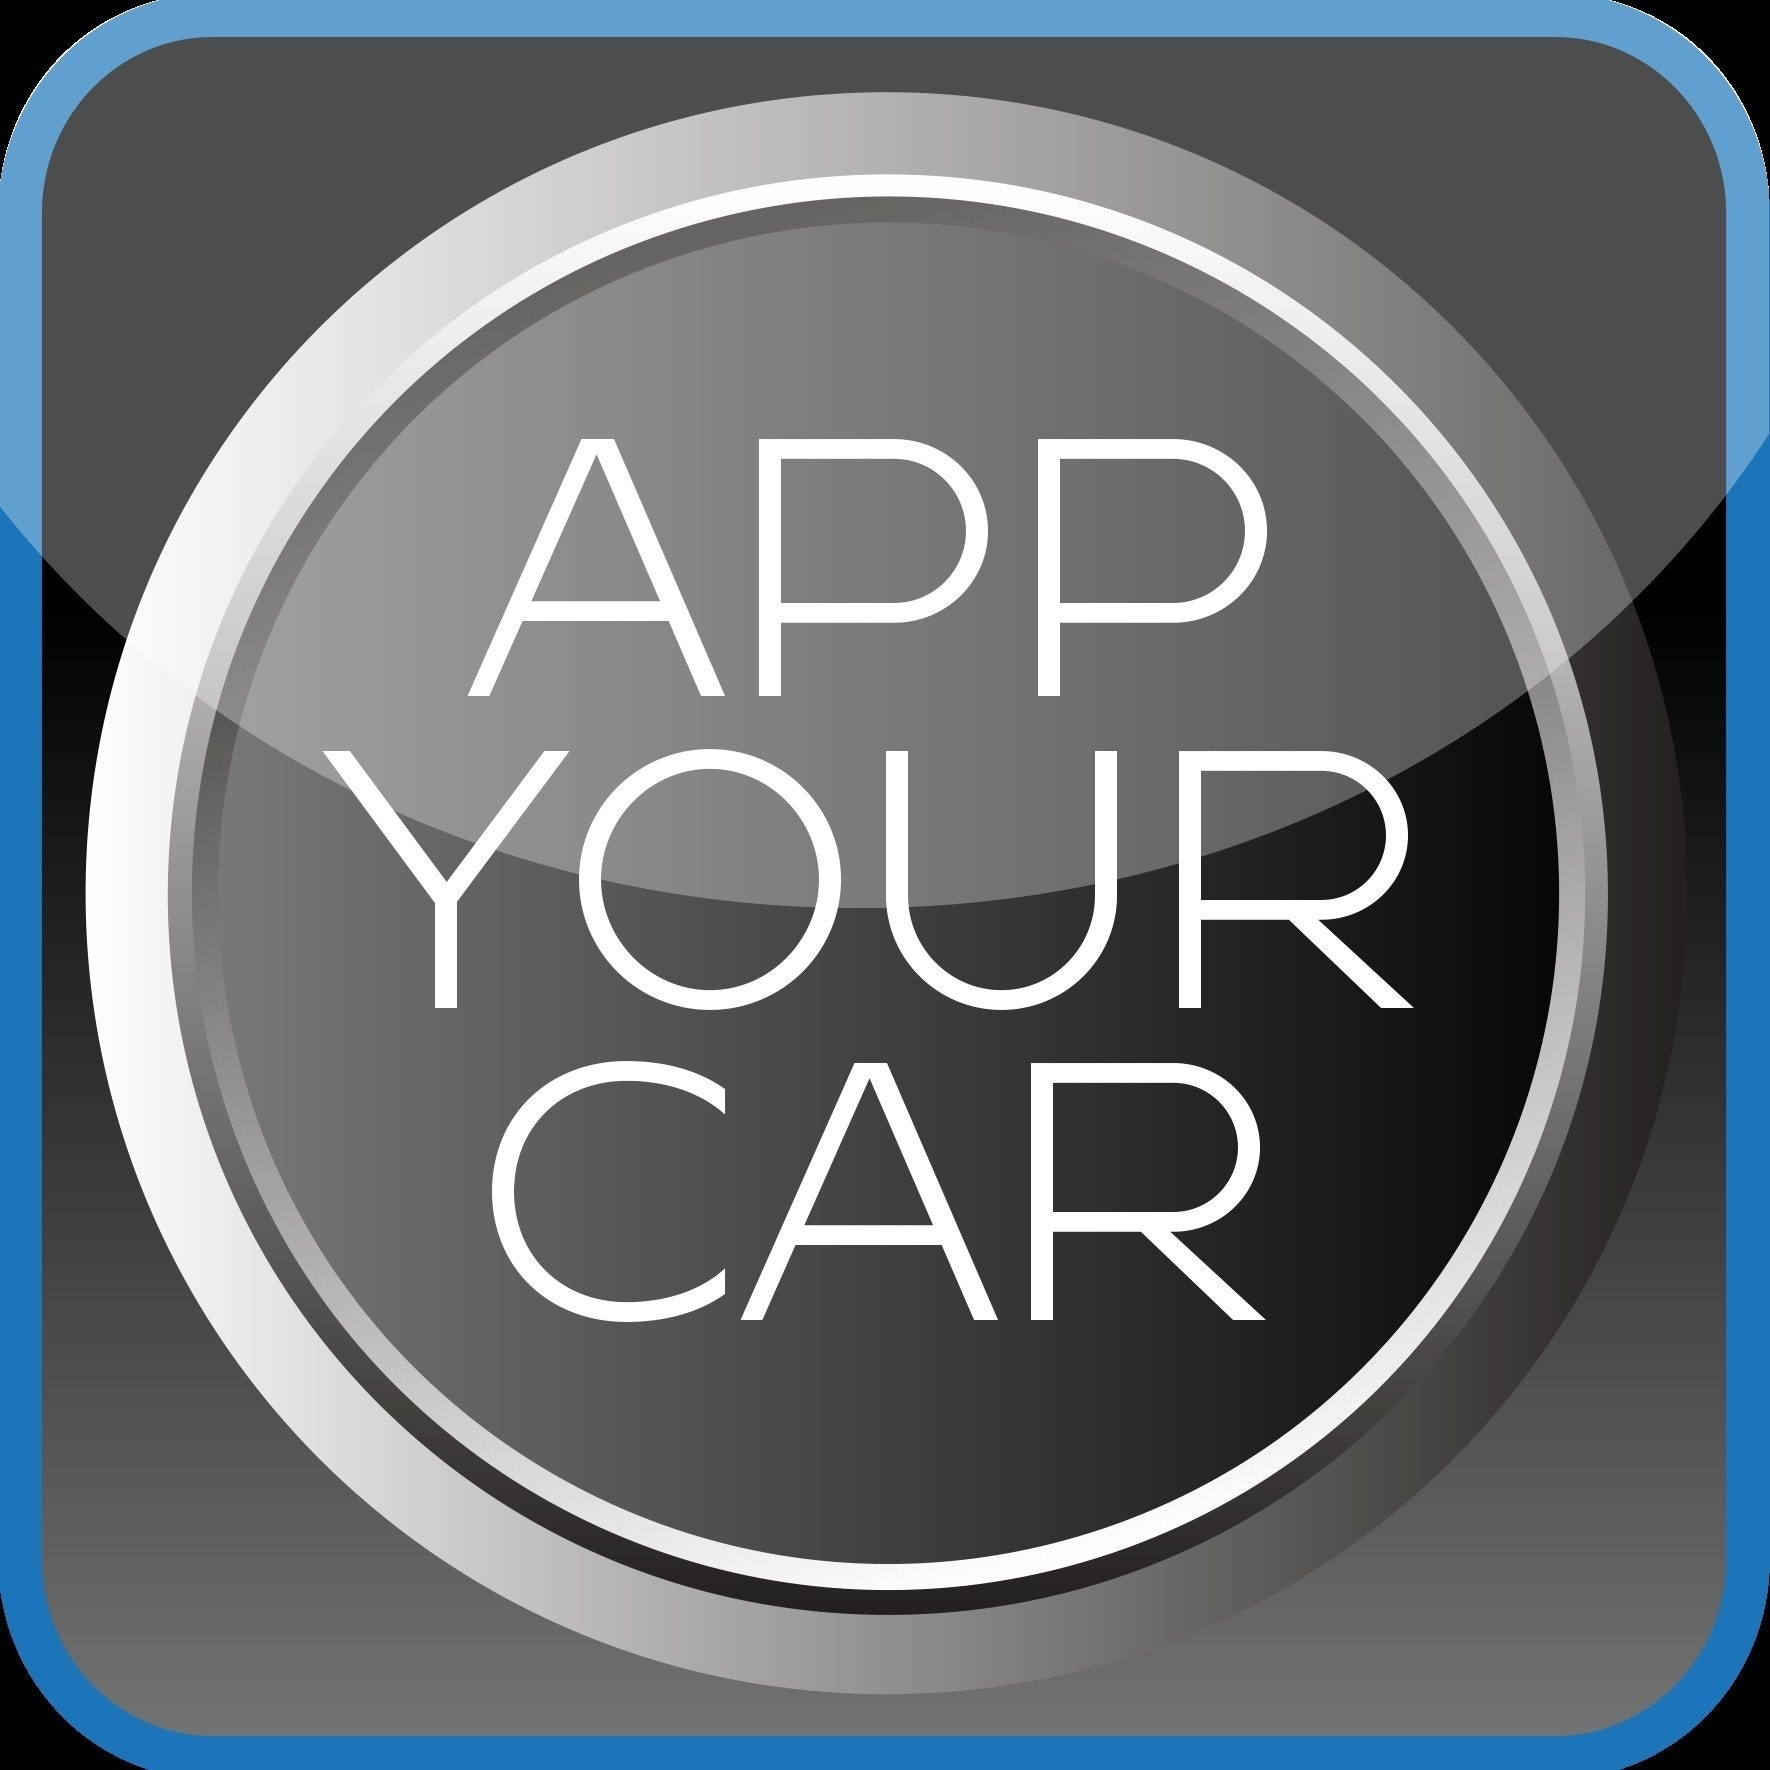 App Your Car